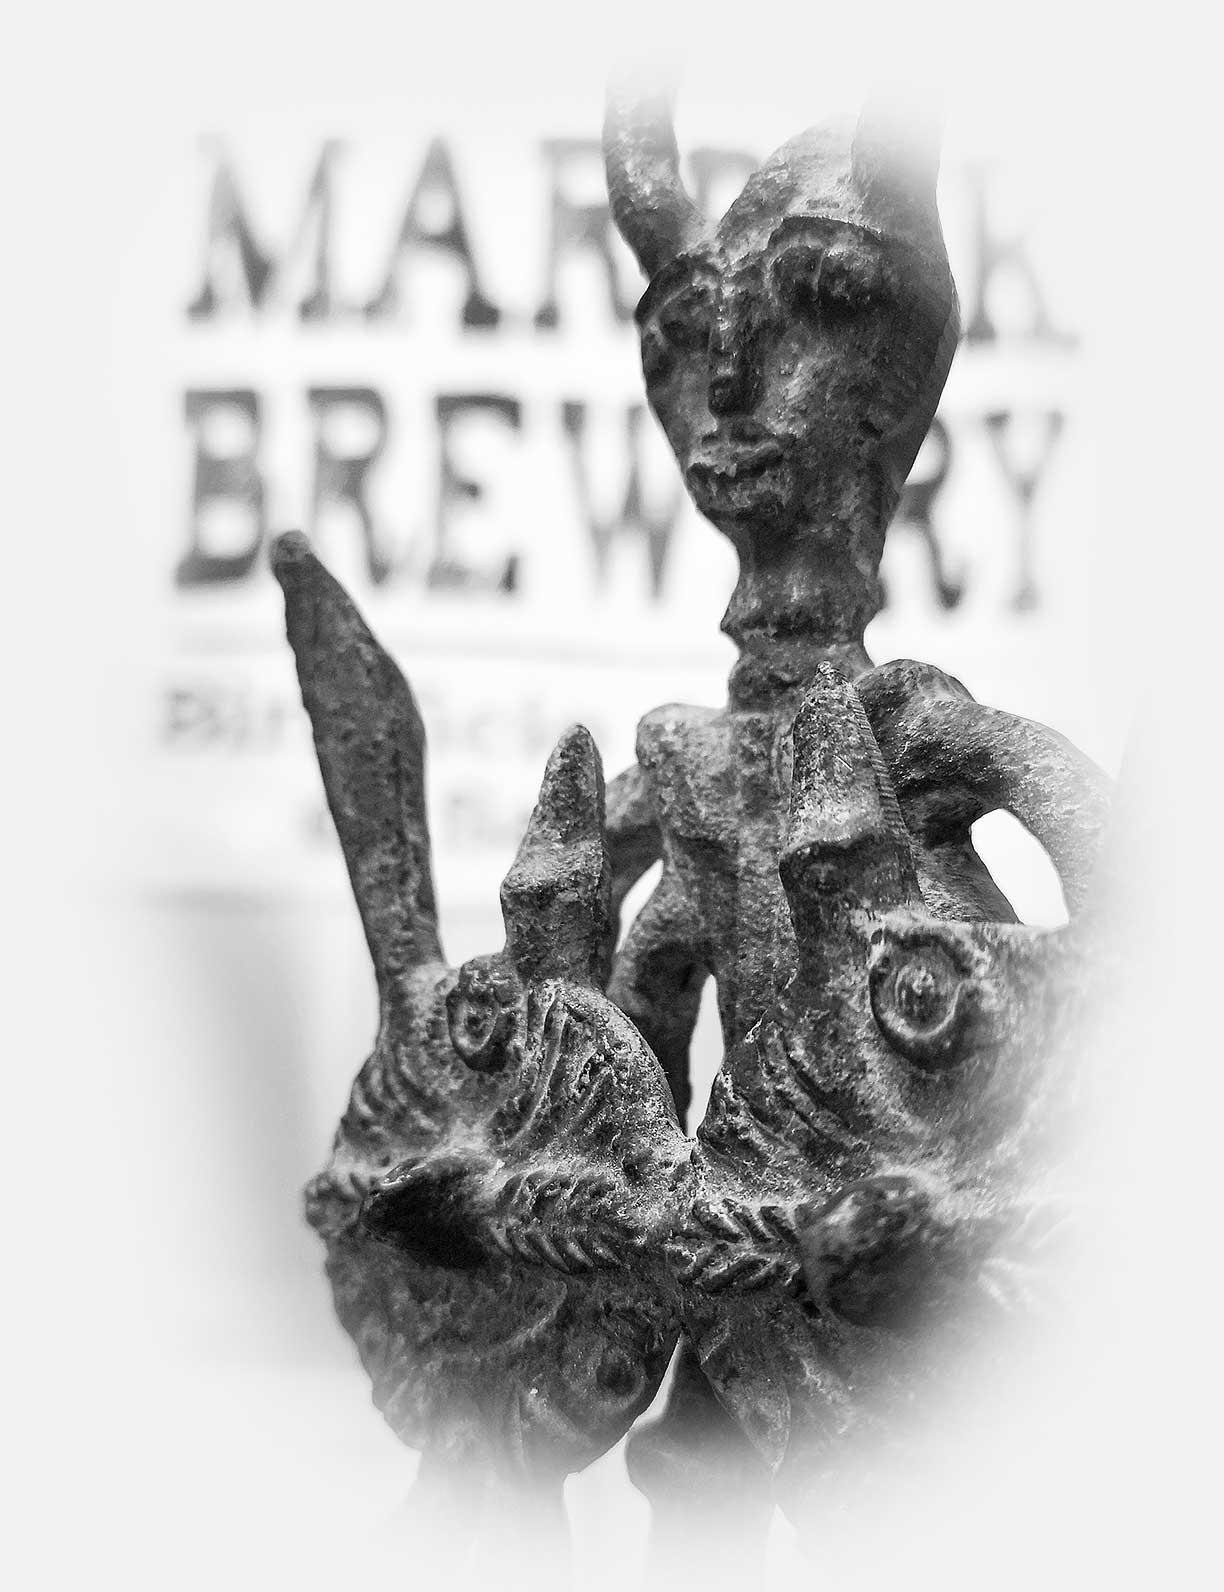 https://www.birrificiomarduk.com/wp-content/uploads/2020/05/05b_brand_storia_nuragica_Marduk_brewery_birrificio_agricolo_guarda_oltre_birre_Irgoli_Sardegna.jpg